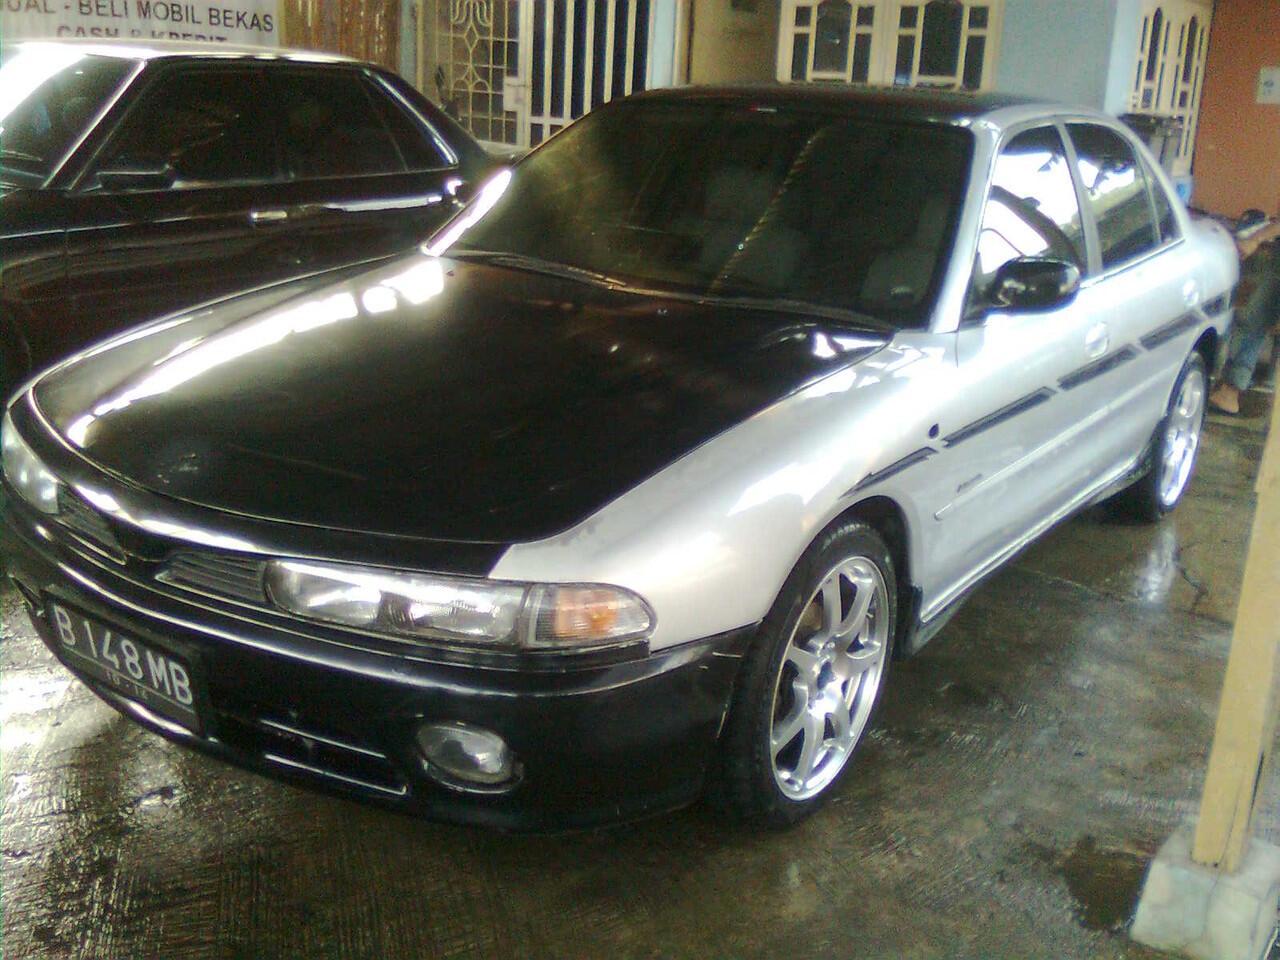 MITSUBISHI GALANT V6 A/T 1993 SILVER.... MBL CAKEP